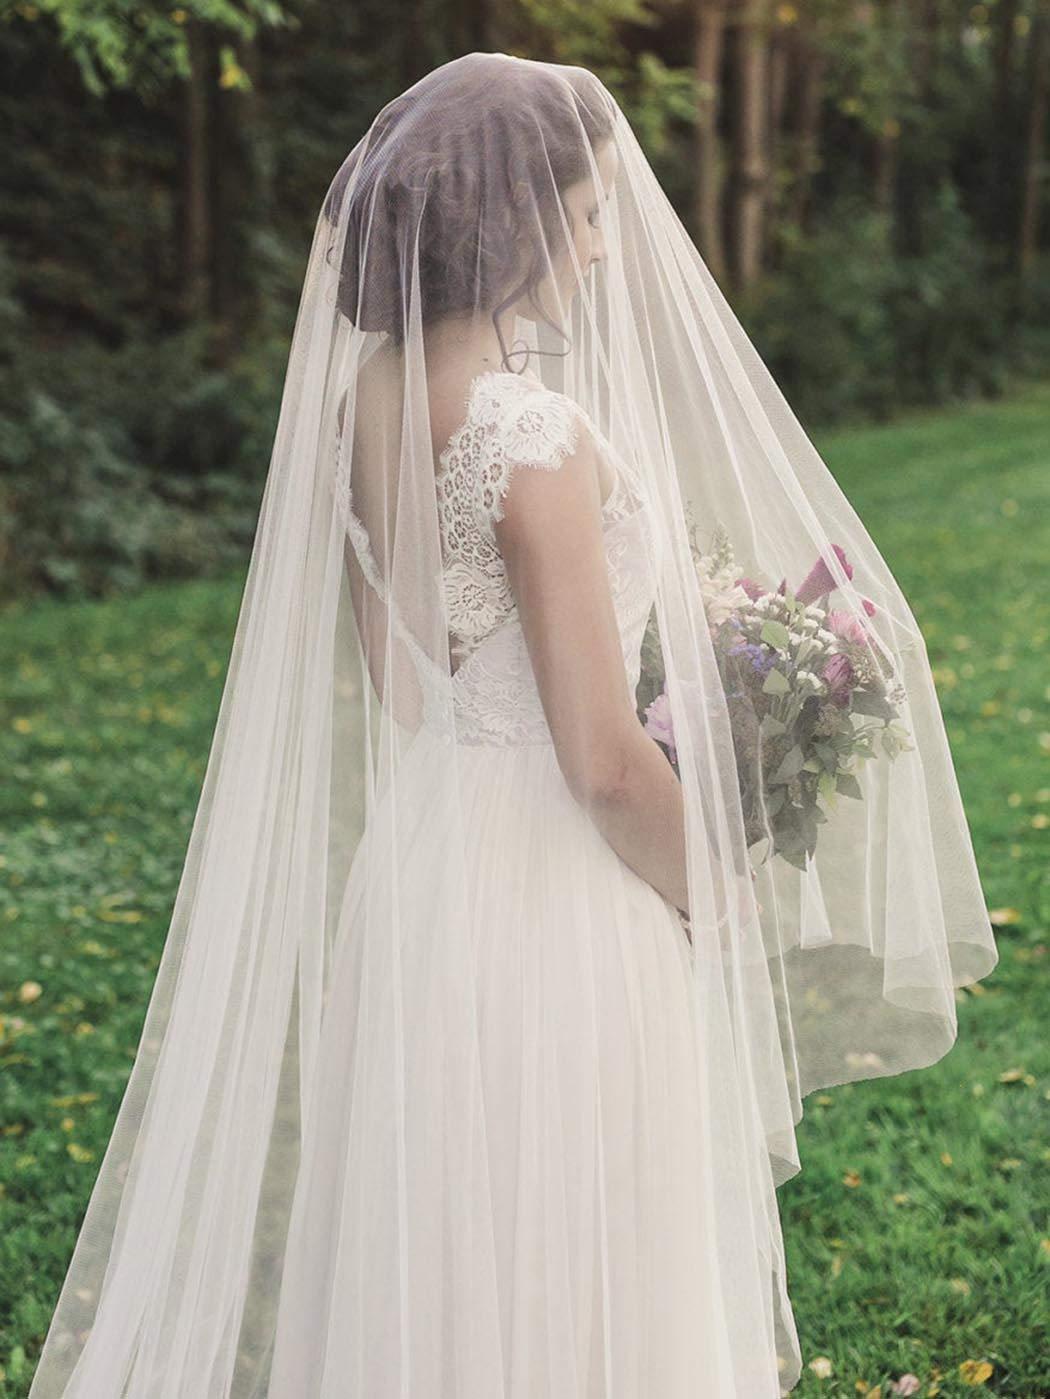 Whisttle 1 Tier Bridal Wedding Veil 118